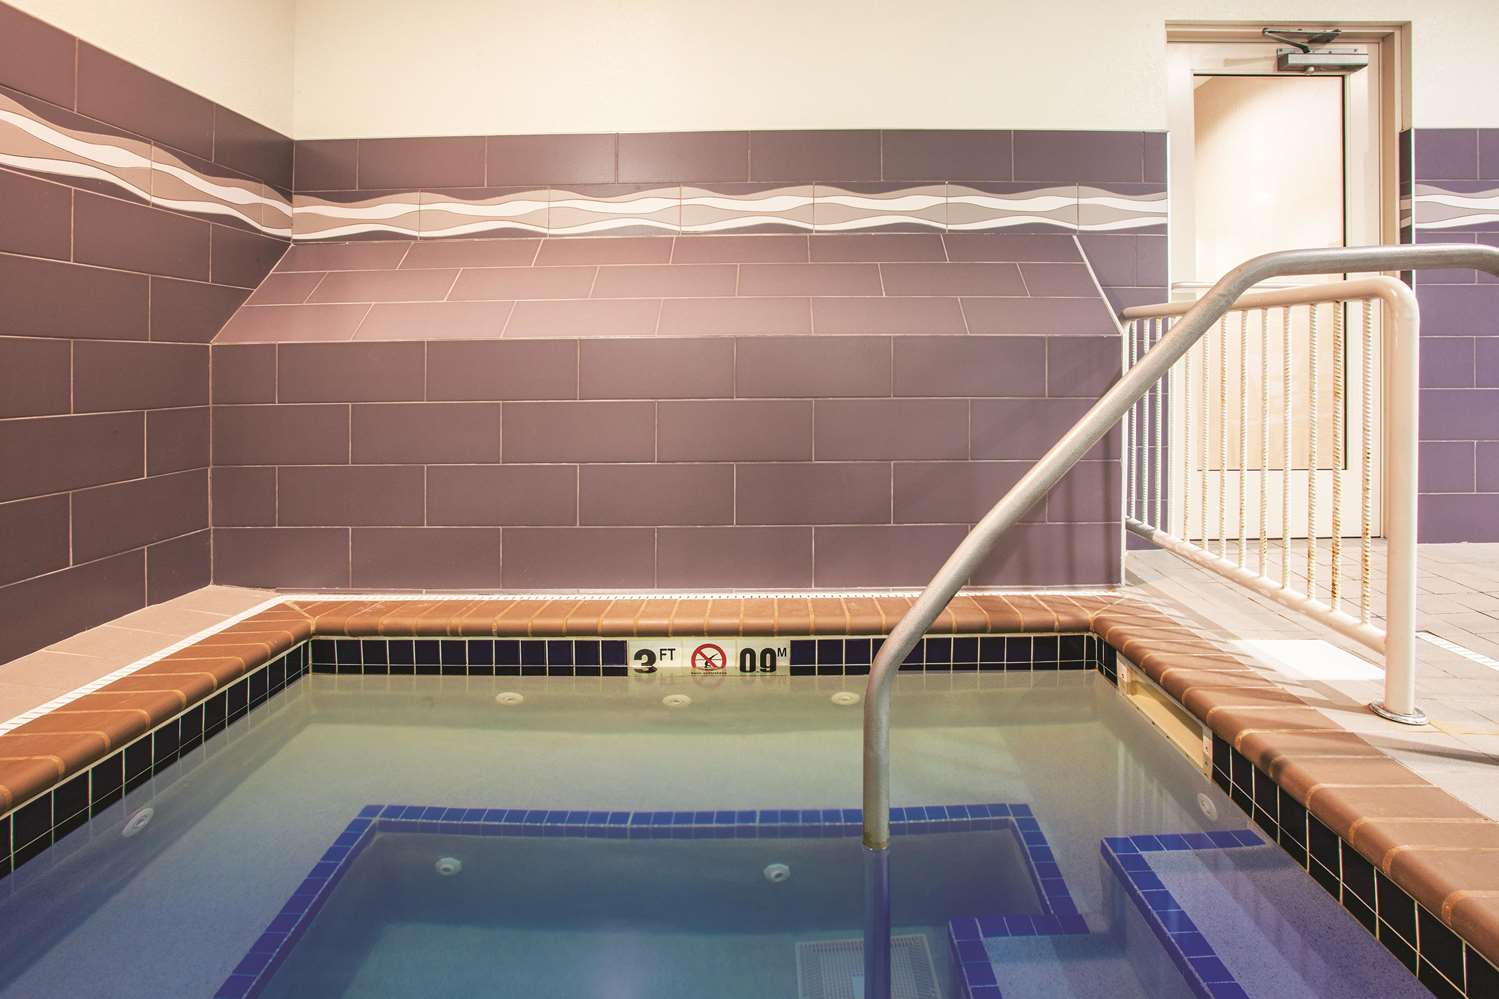 Pool - La Quinta Inn & Suites Duluth